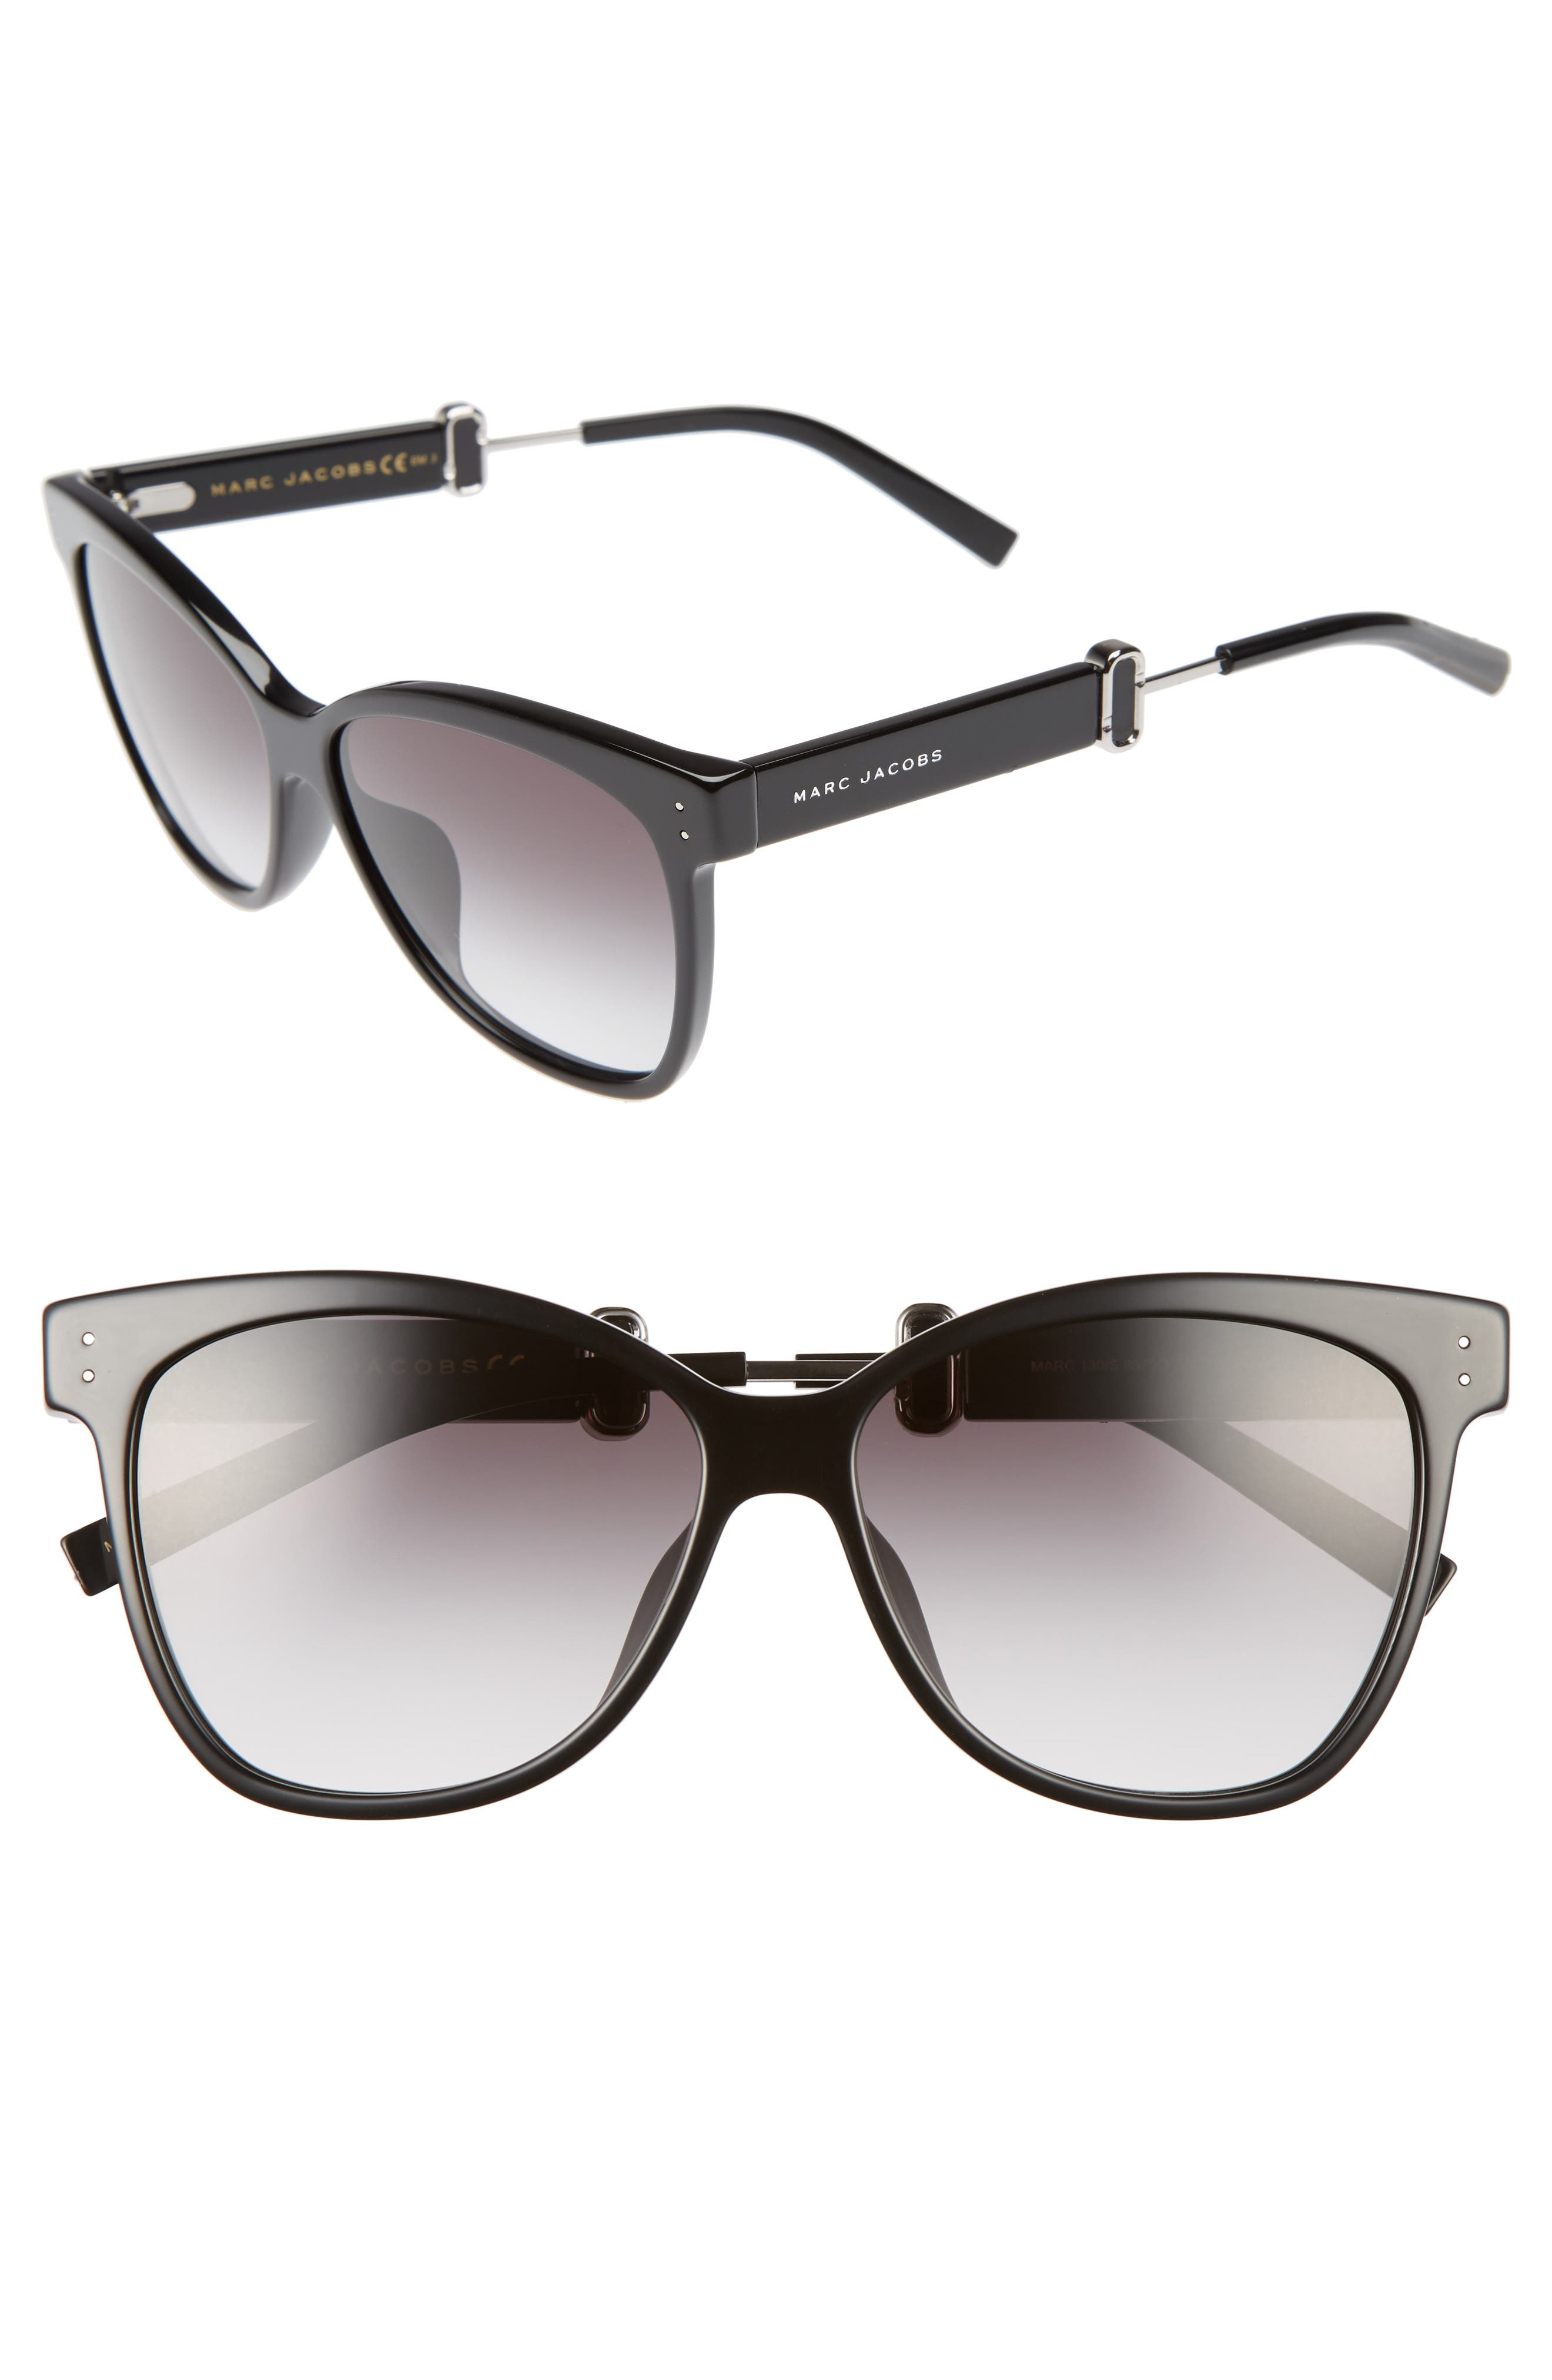 MARC JACOBS 55mm Sunglasses